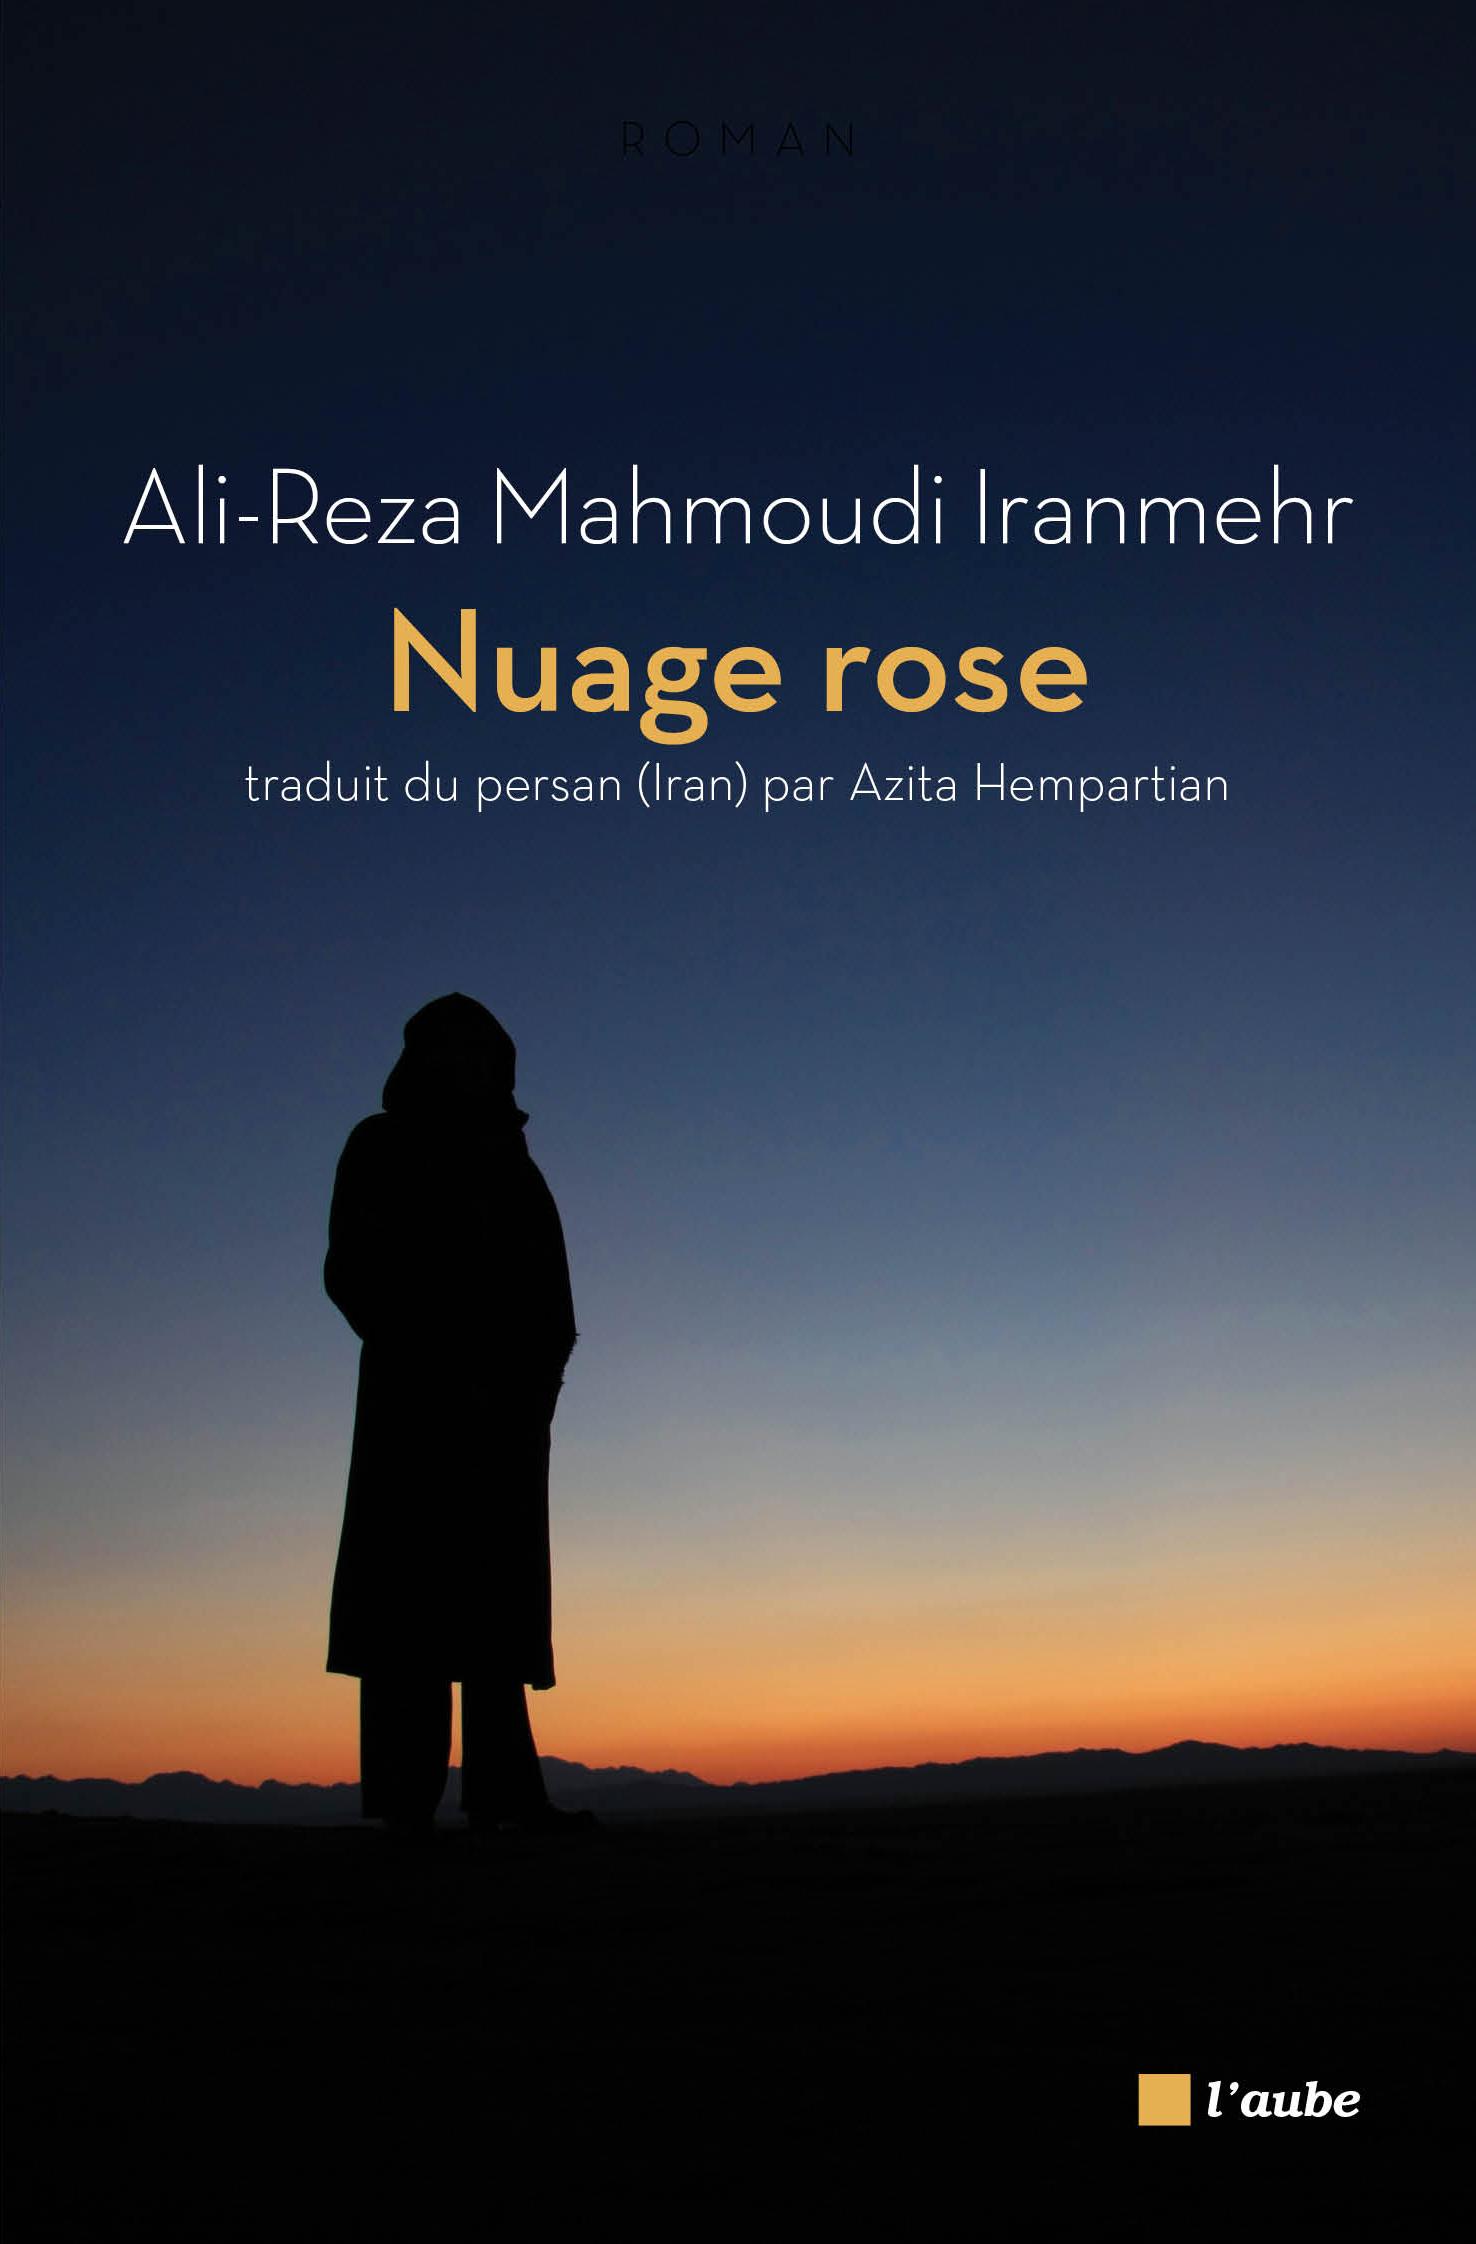 Nuage rose